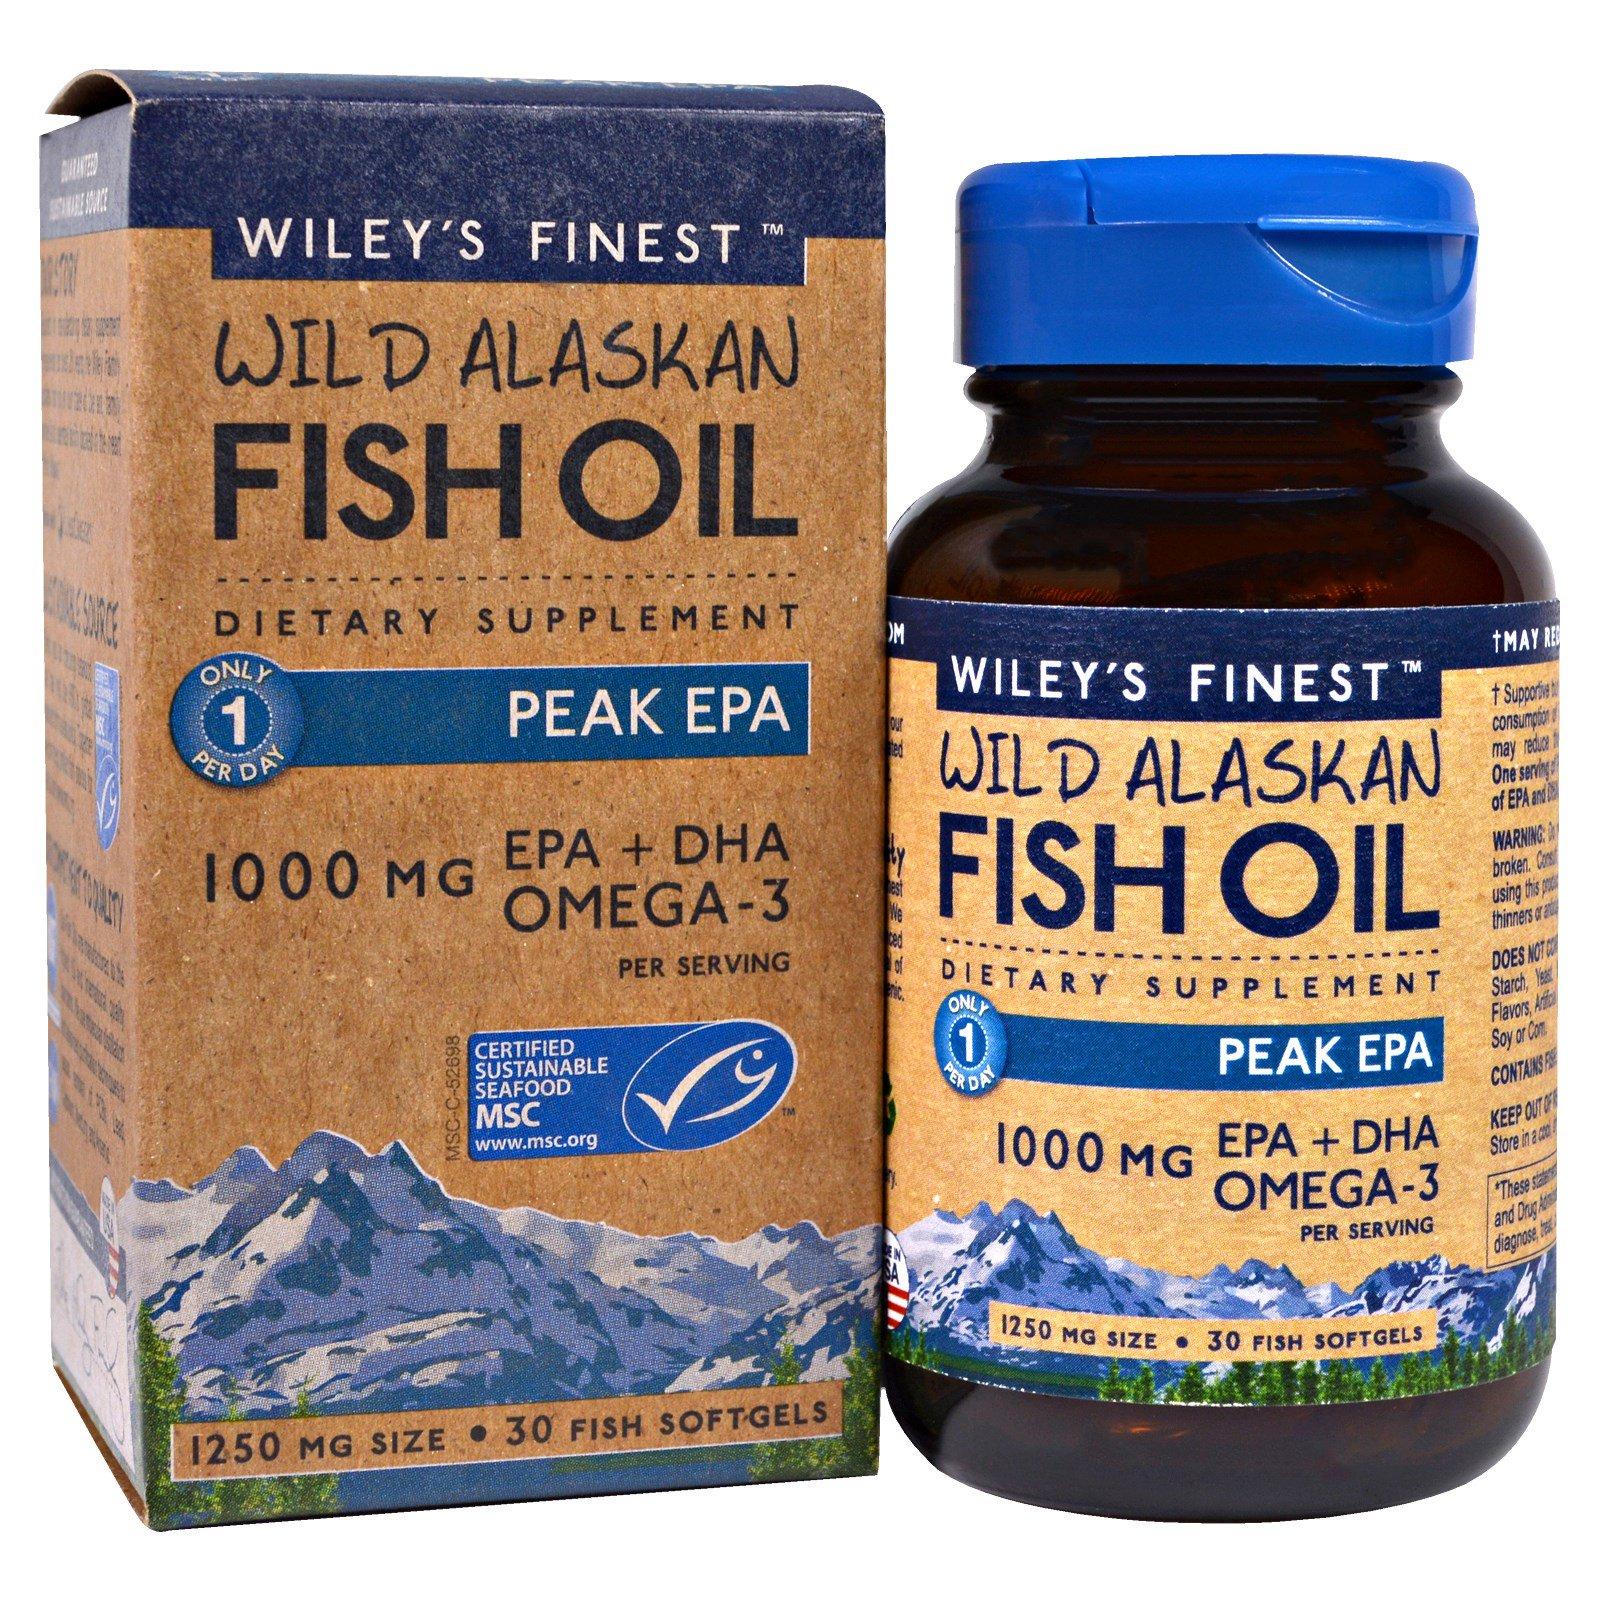 Wiley 39 s finest wild alaskan fish oil peak epa 1250 mg for Fish oil epa dha